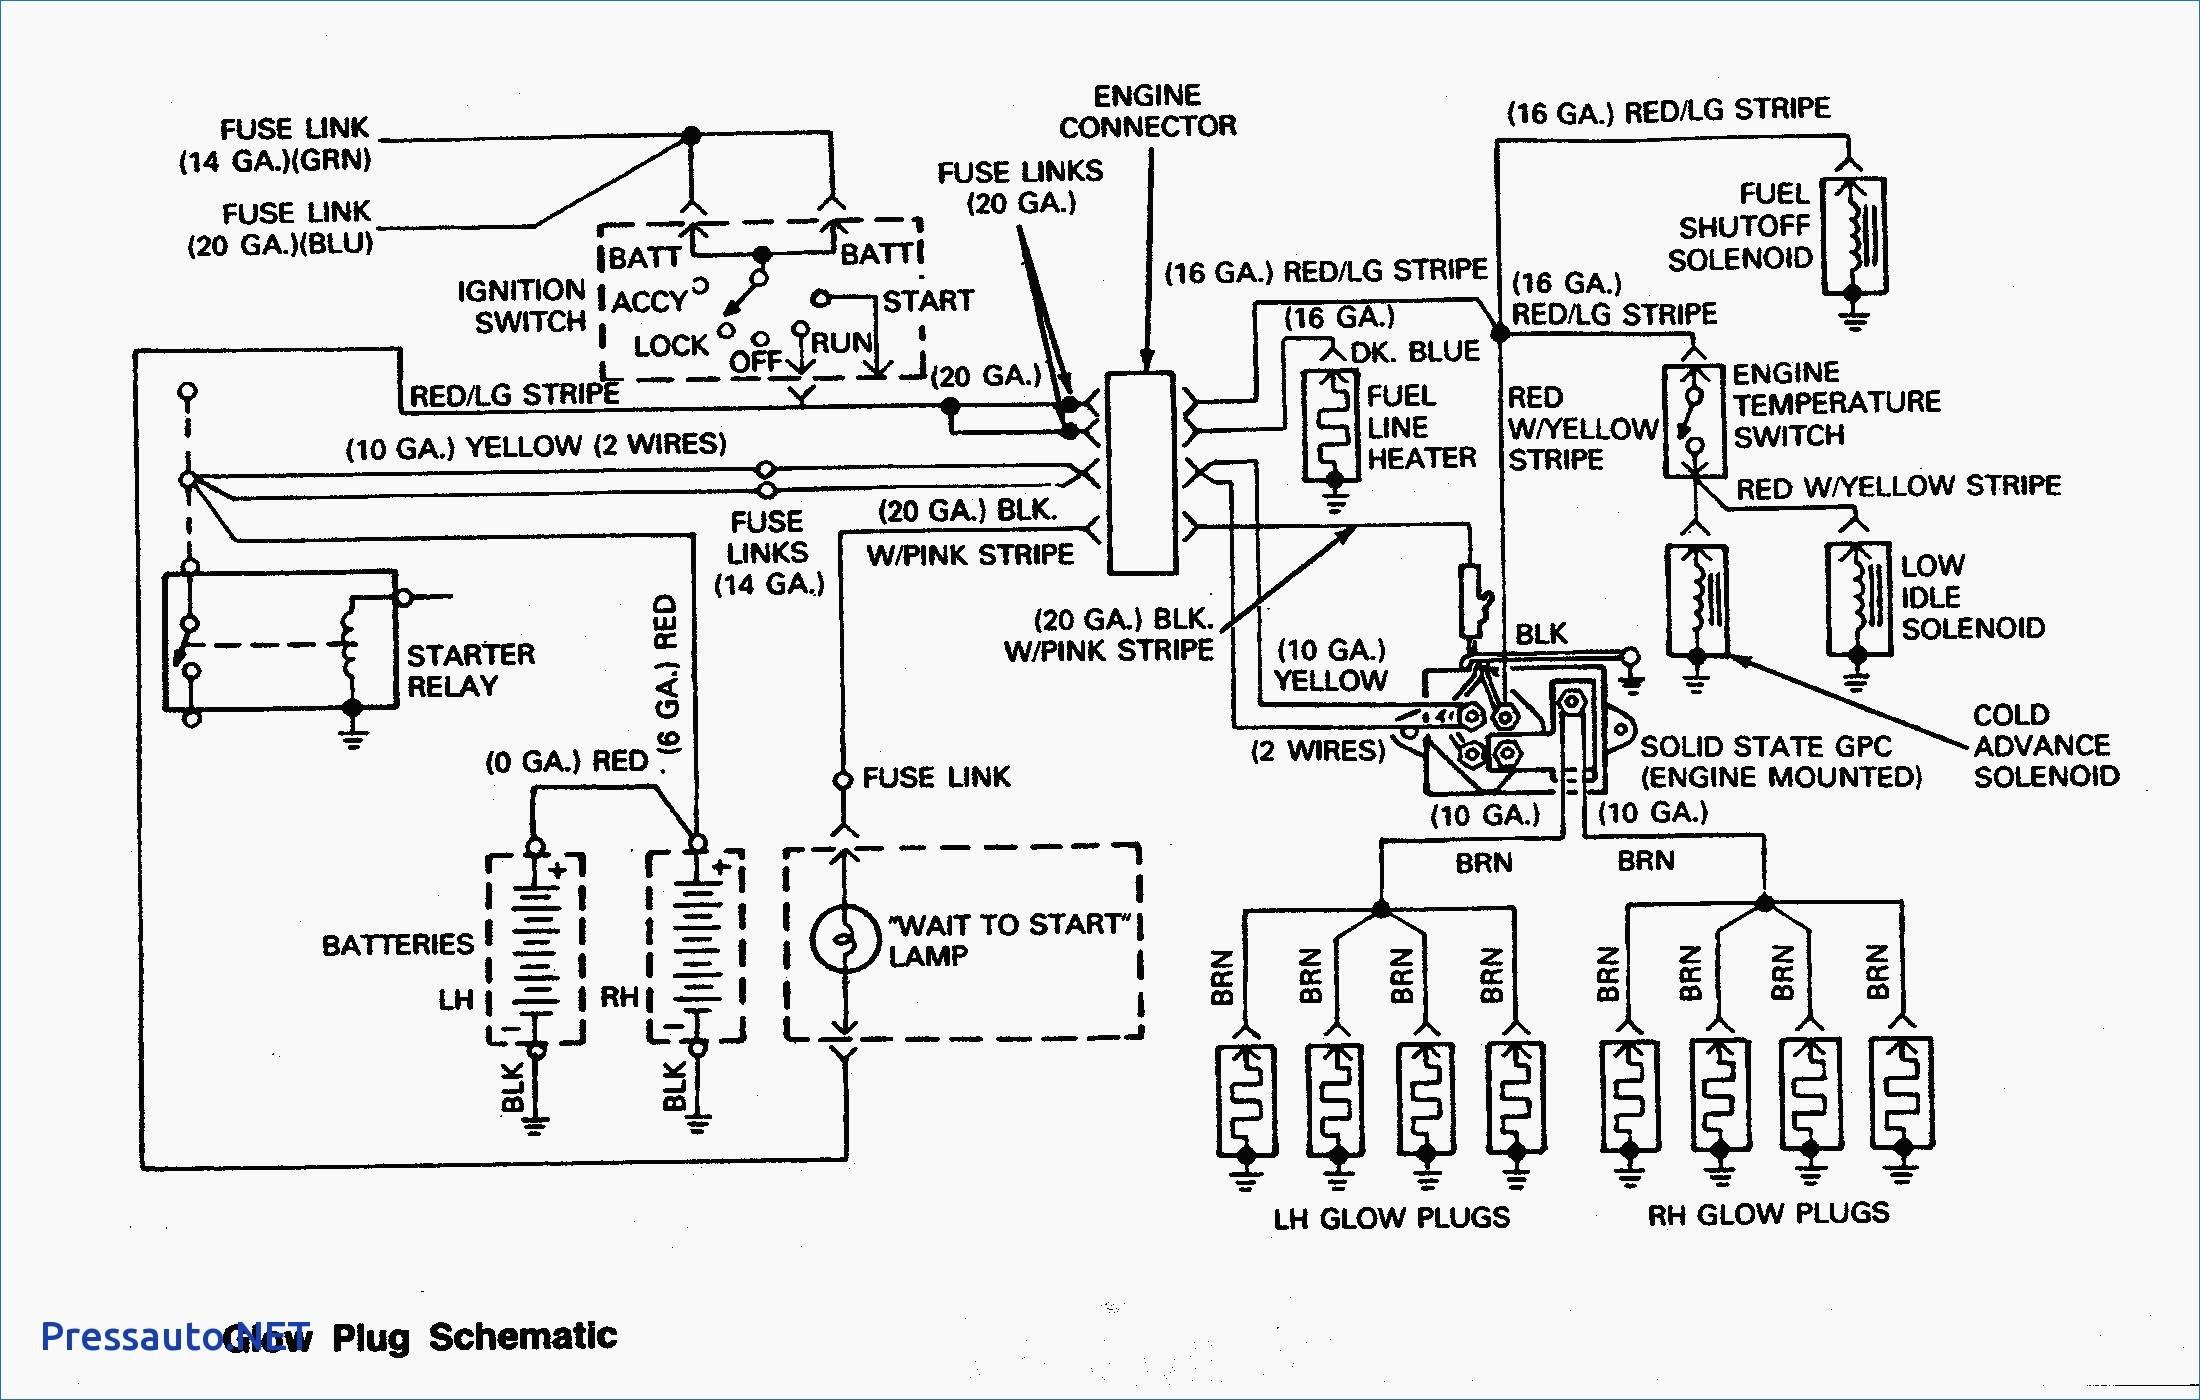 kr_7628] ford 7 3 glow plug relay wiring diagram moreover 7 3 ... 7 3 powerstroke engine wiring diagram  indi sapebe mohammedshrine librar wiring 101